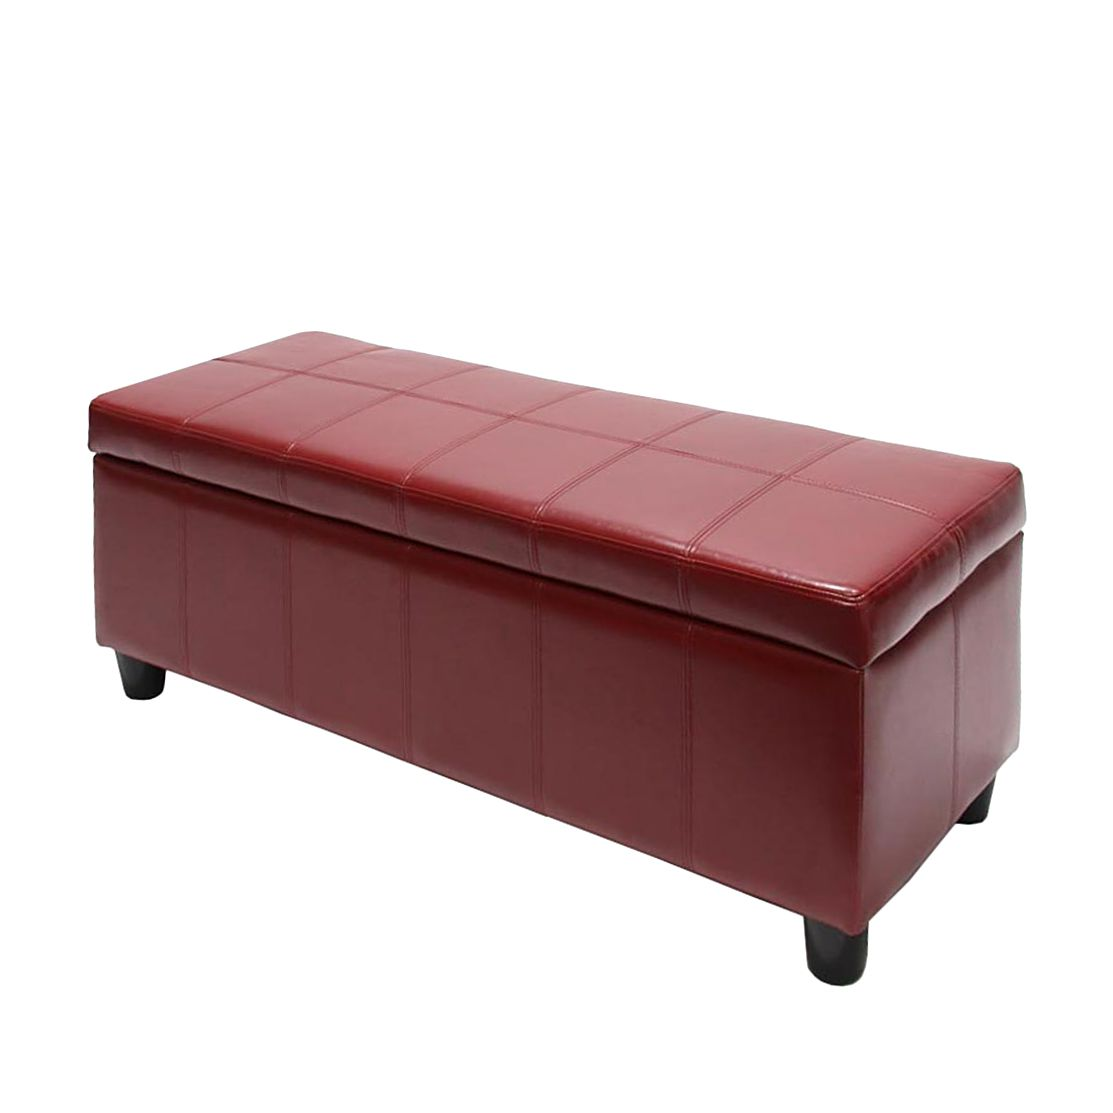 Sitzbank Arezzo – Leder – Rot, Mendler jetzt kaufen